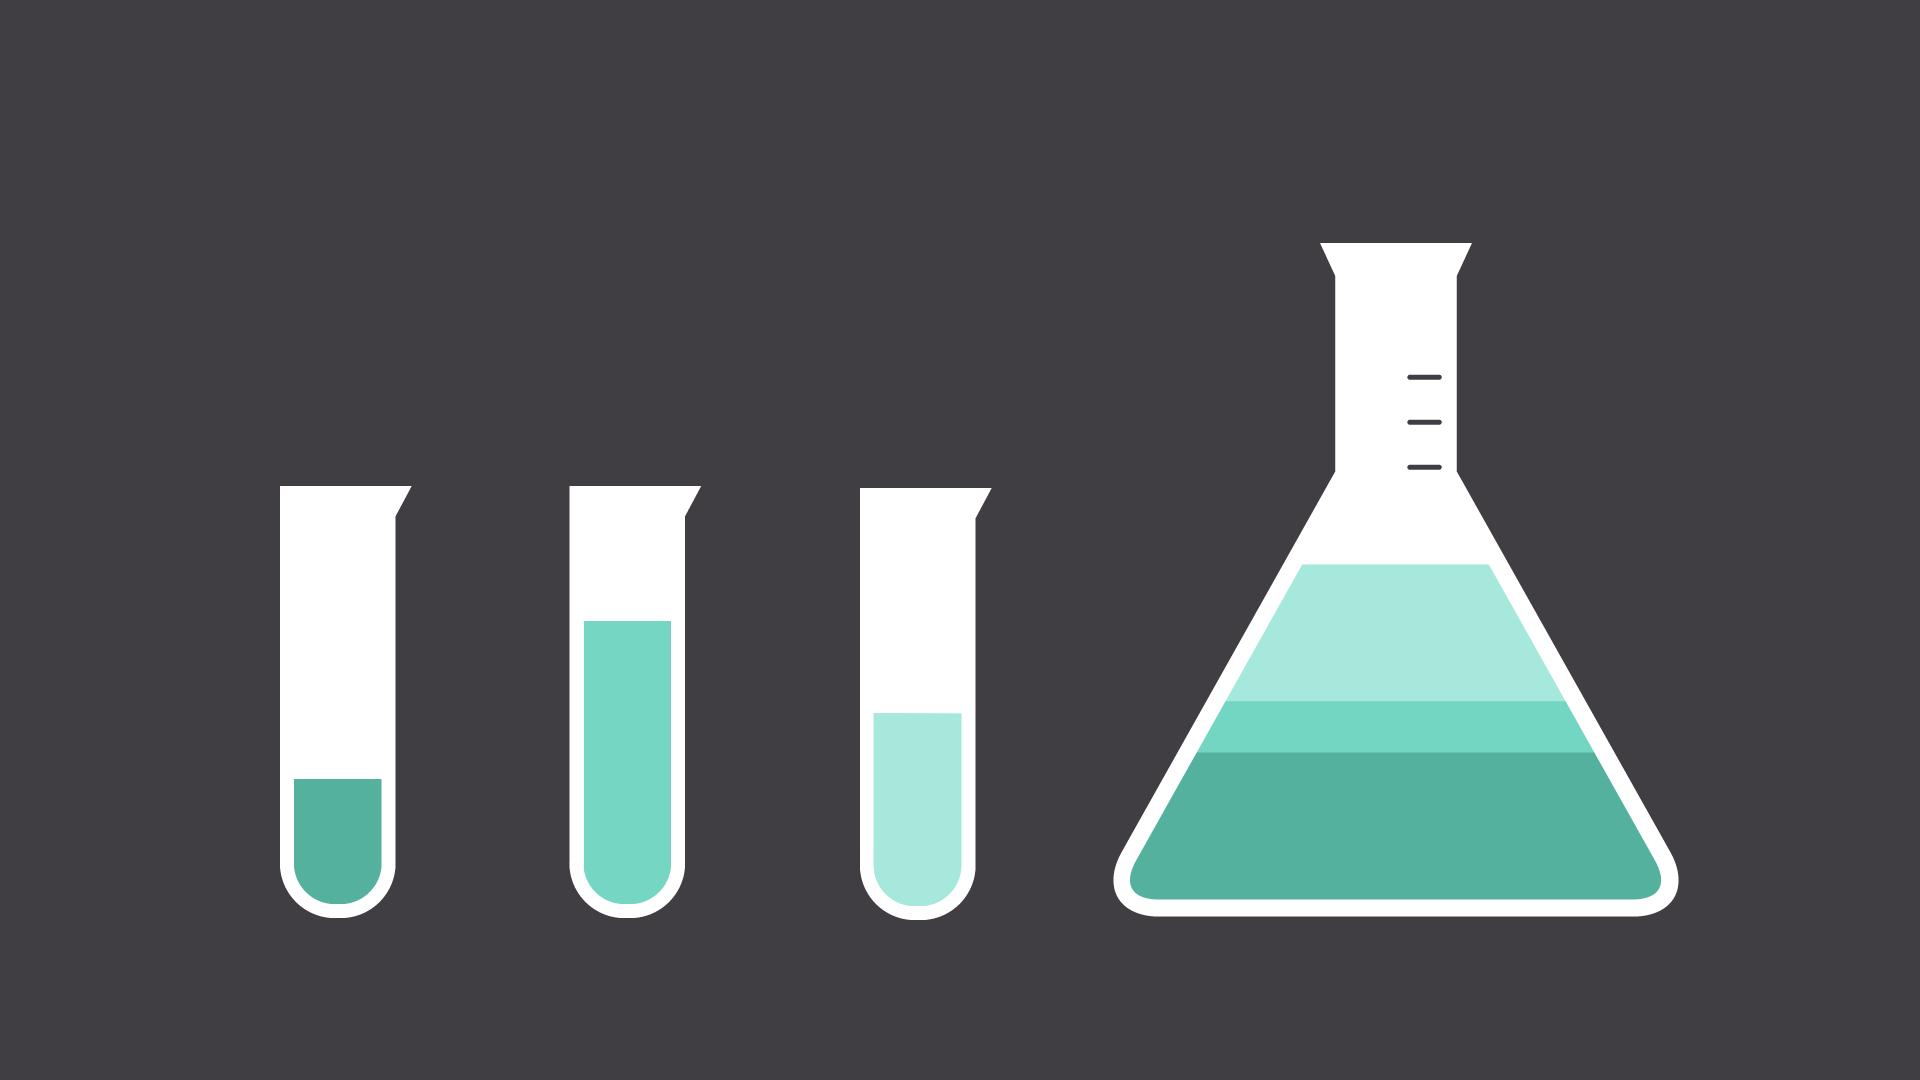 химия топтому